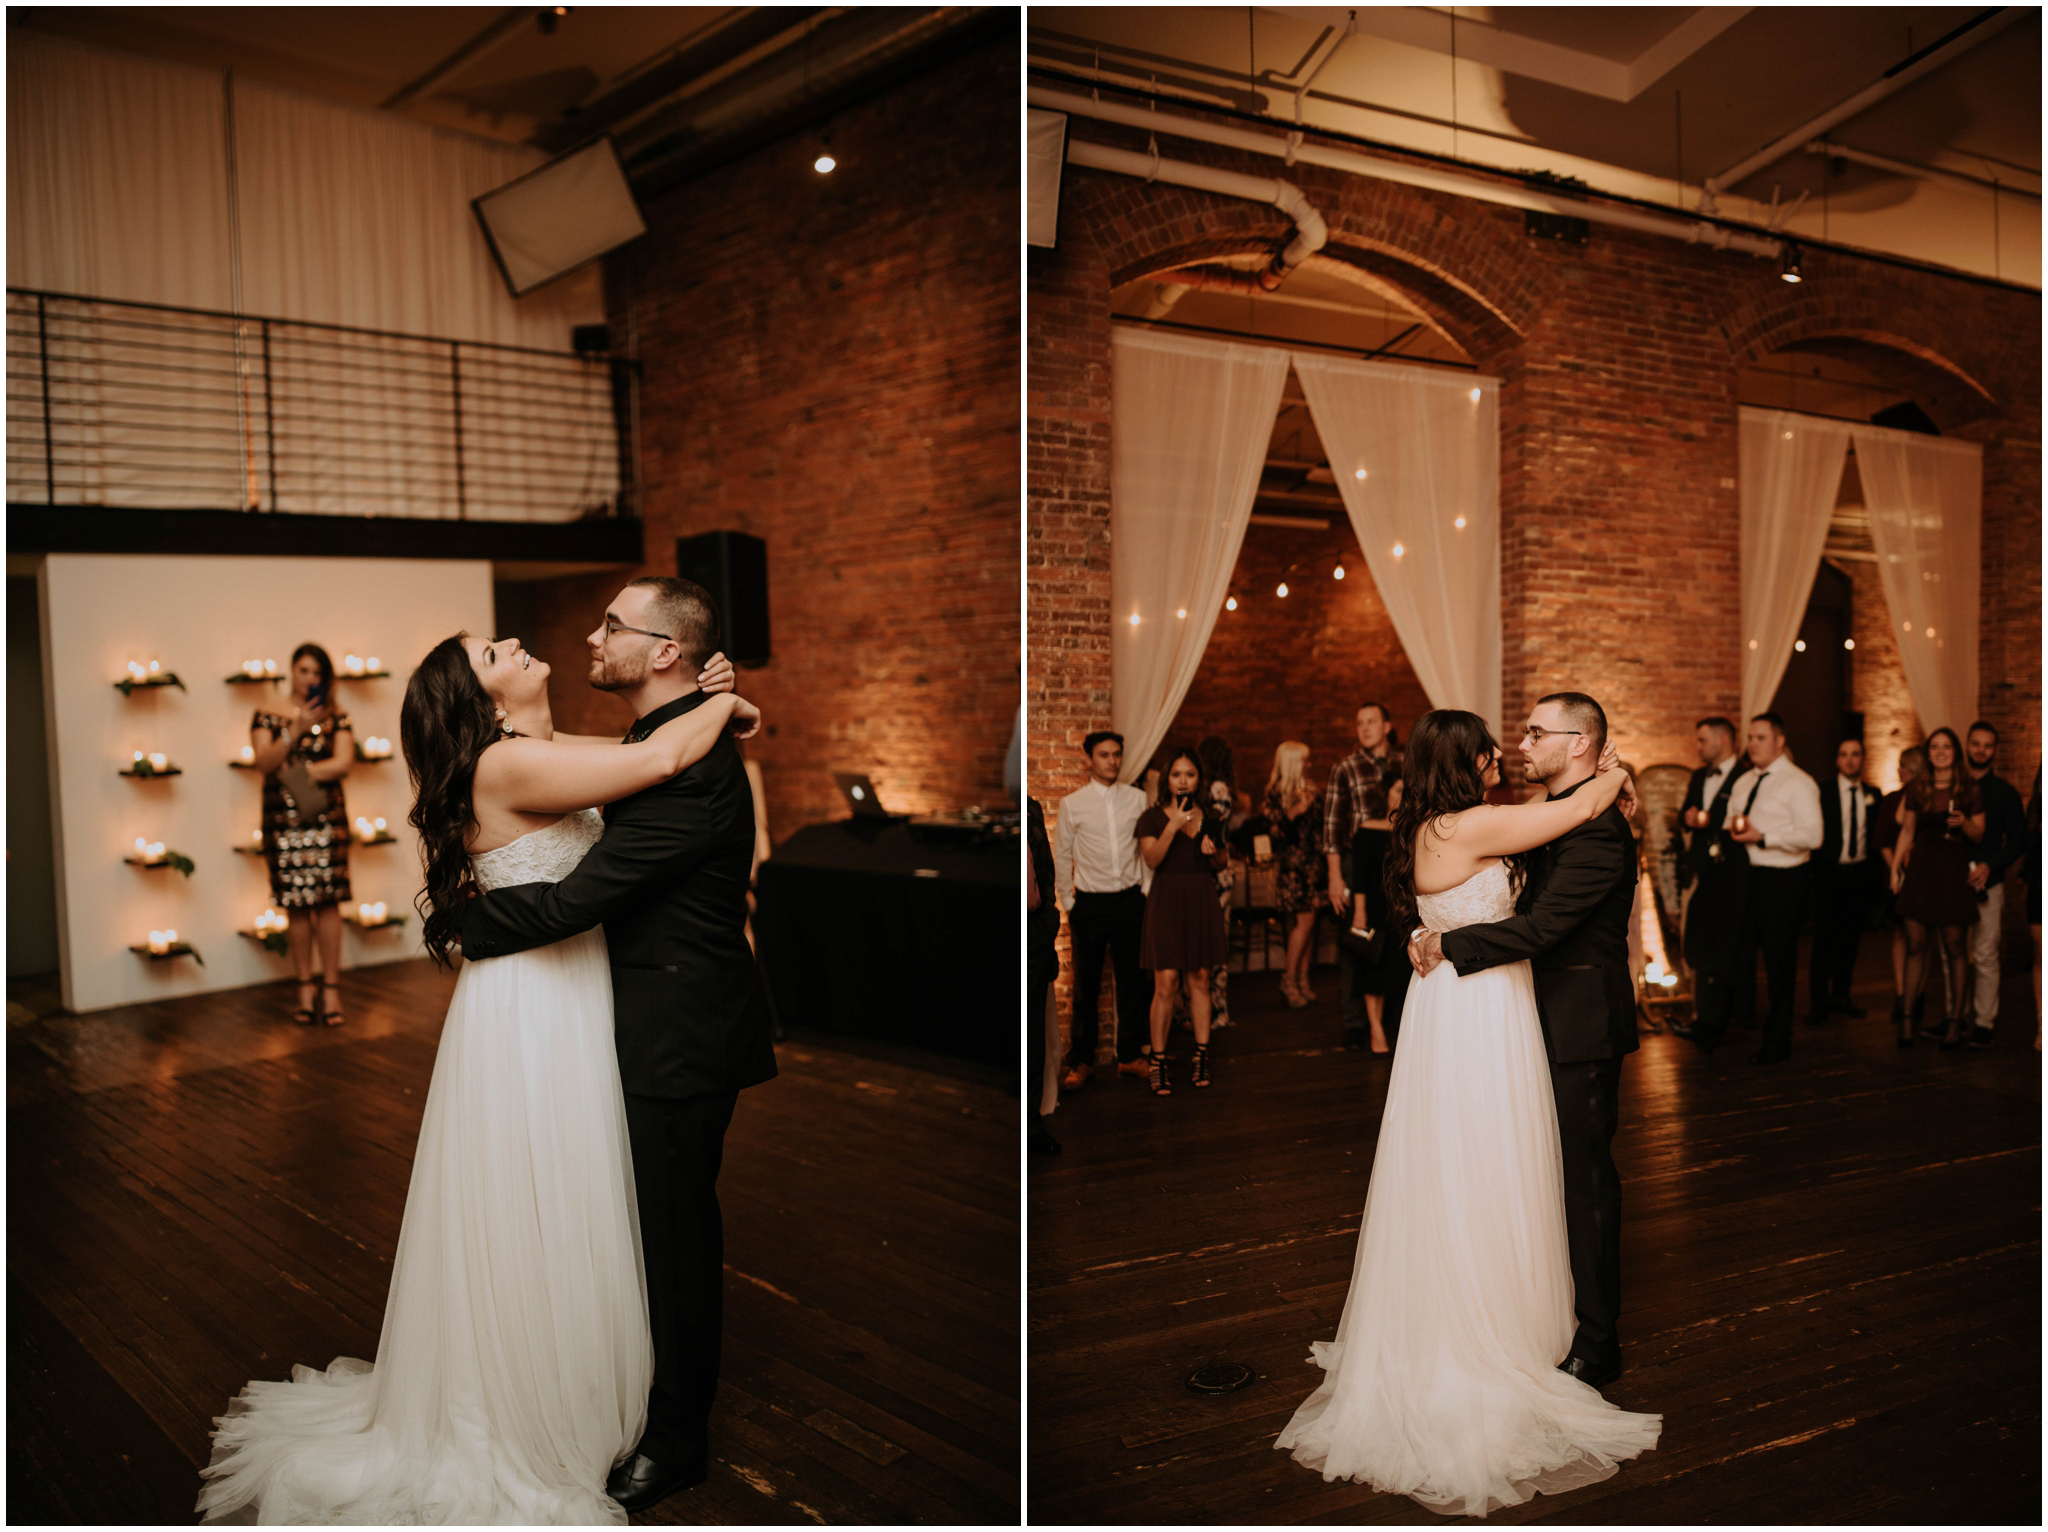 danny+mackenzie+downtown-seattle-axis-wedding-seattle-photographer-112.jpg